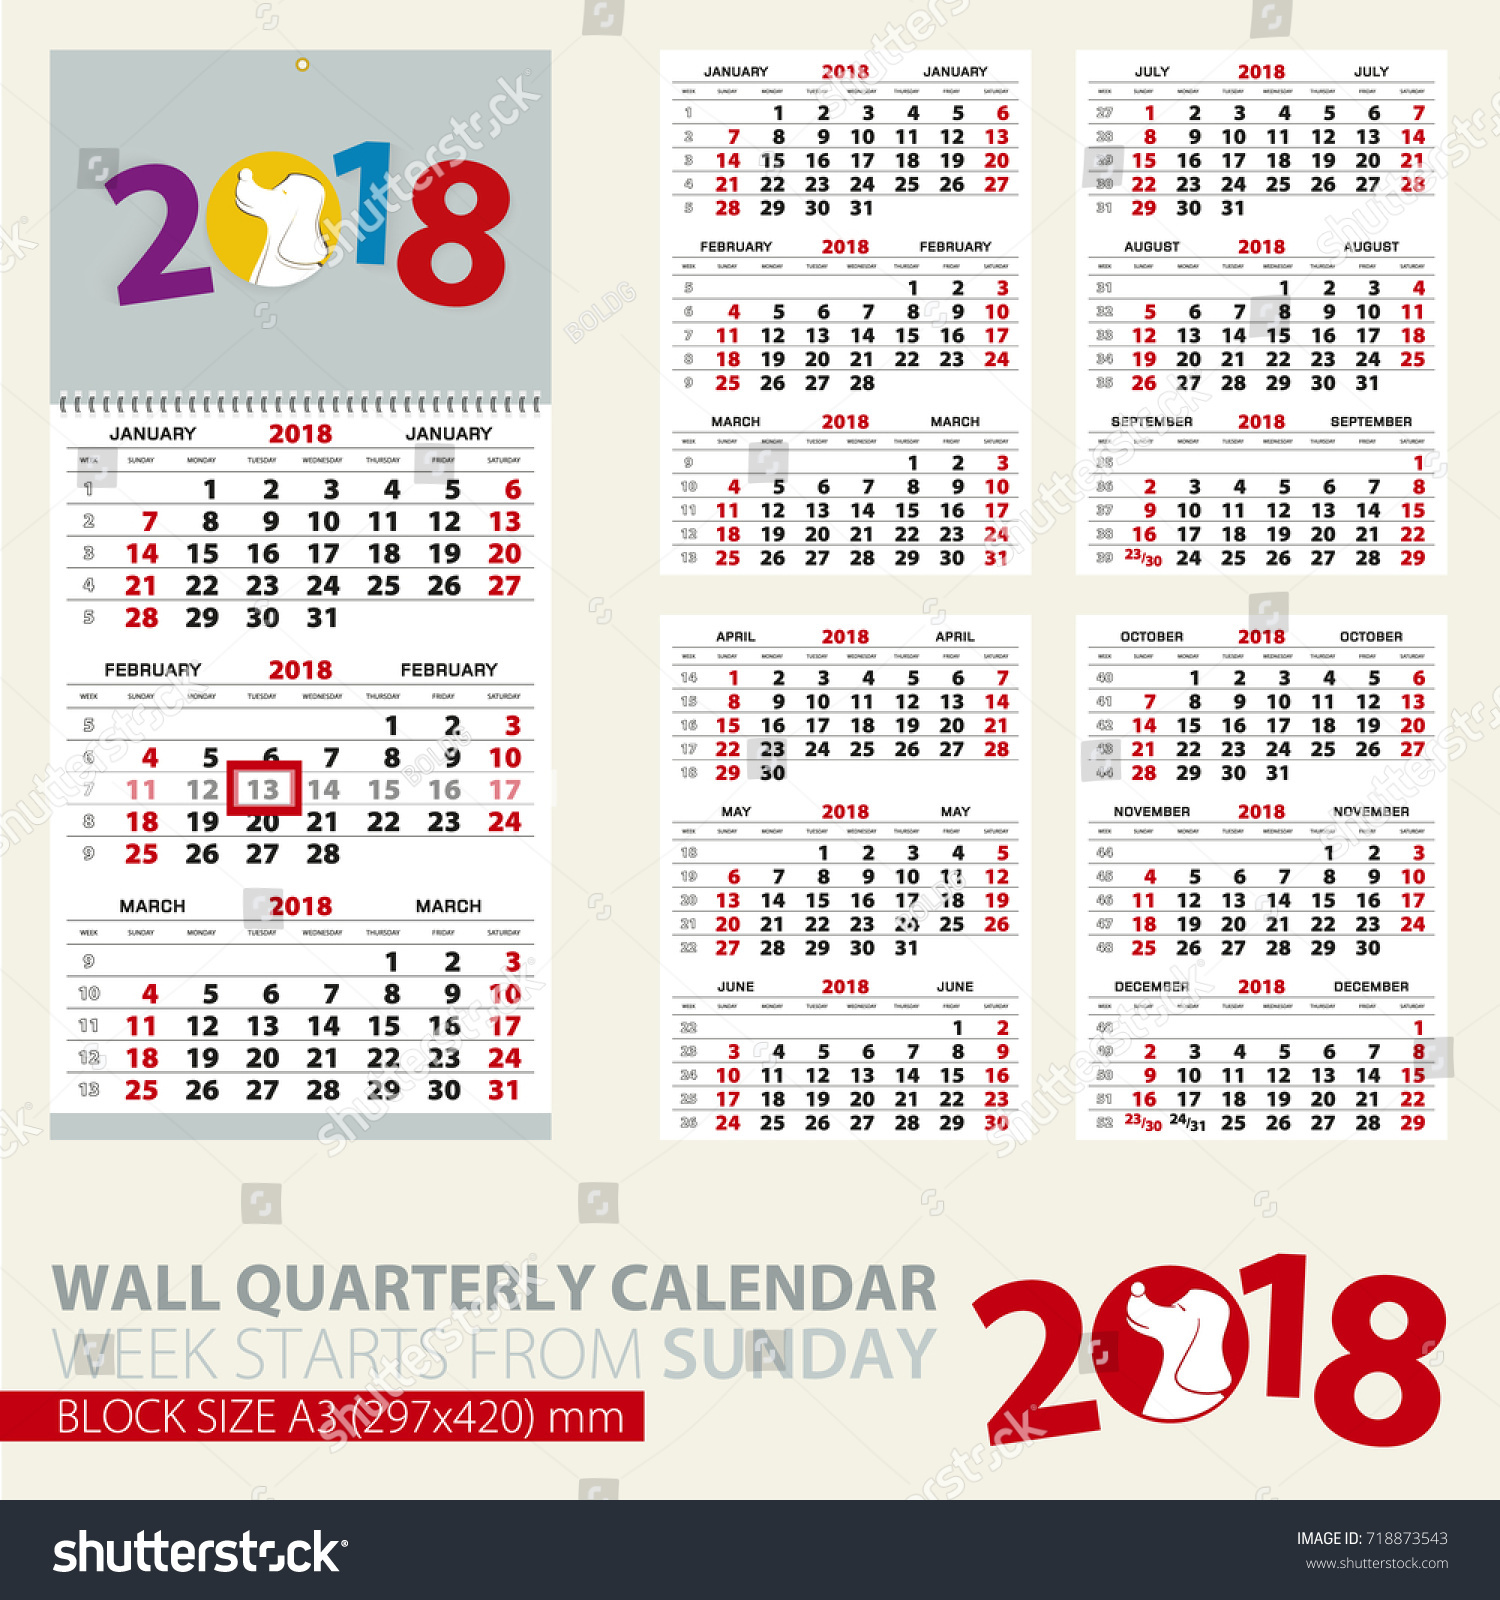 Print Template Wall Quarterly Calendar 2018 Stock Vector Royalty